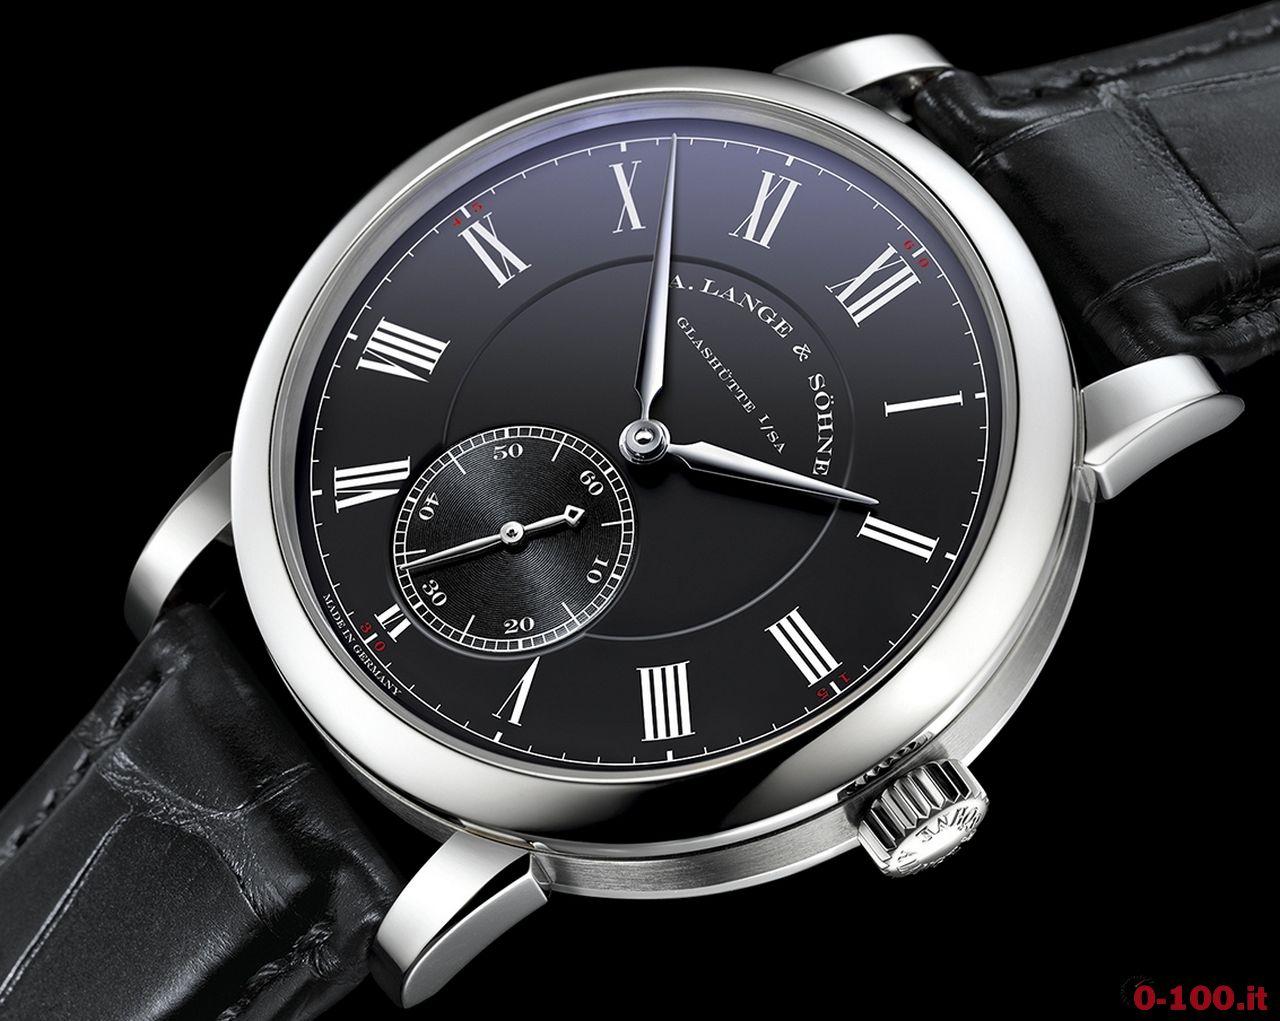 a-lange-sohne-richard-lange-pour-le-merite-limited-edition-ref-260-028-prezzo-price_0-1001